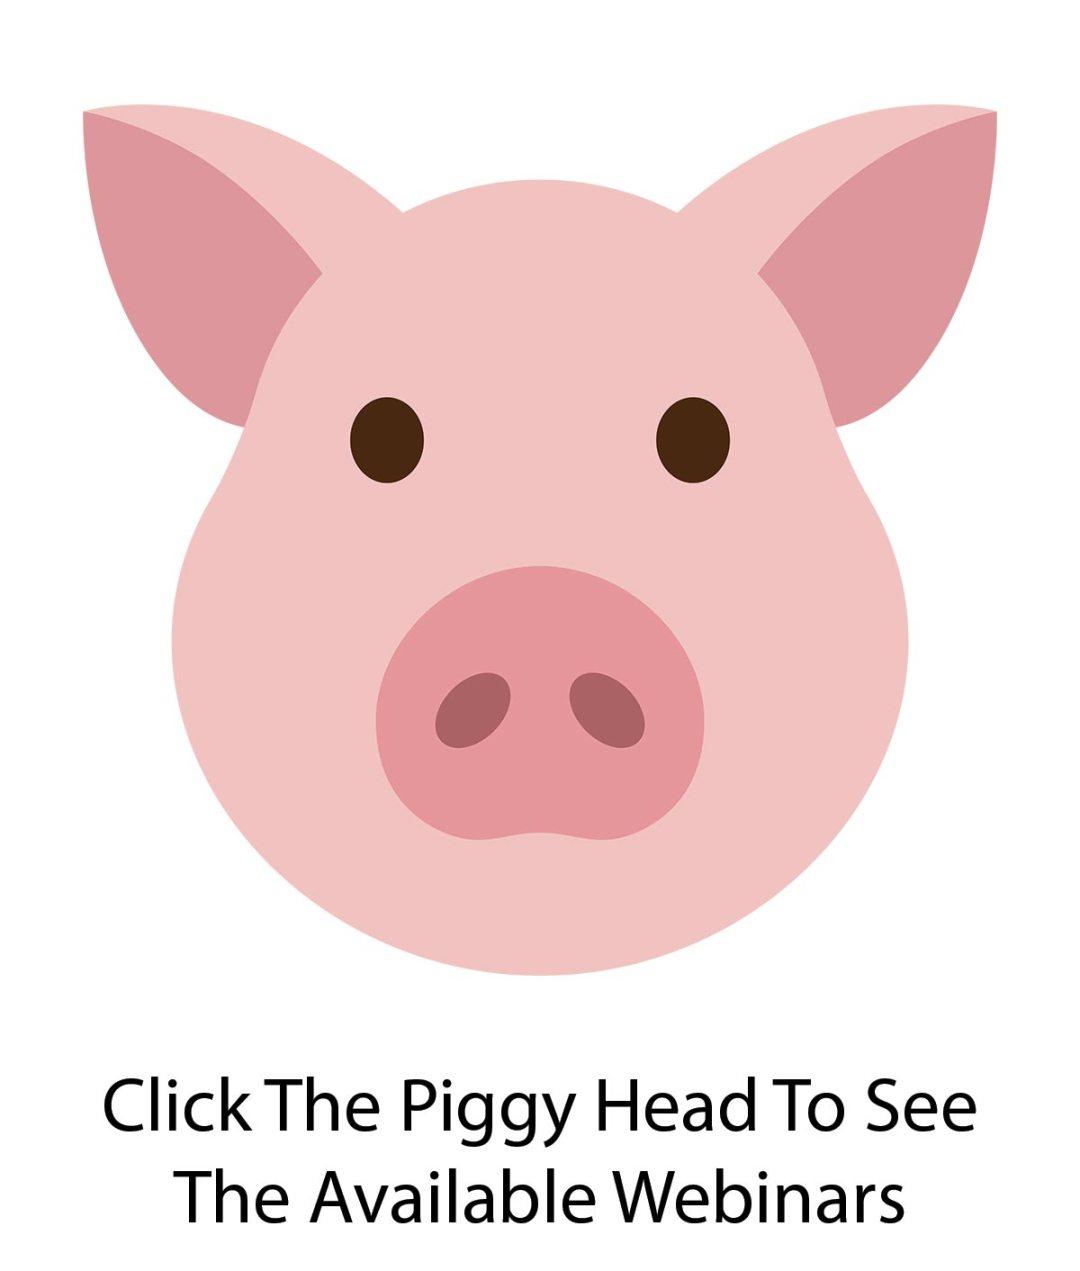 Webinars about your piggy